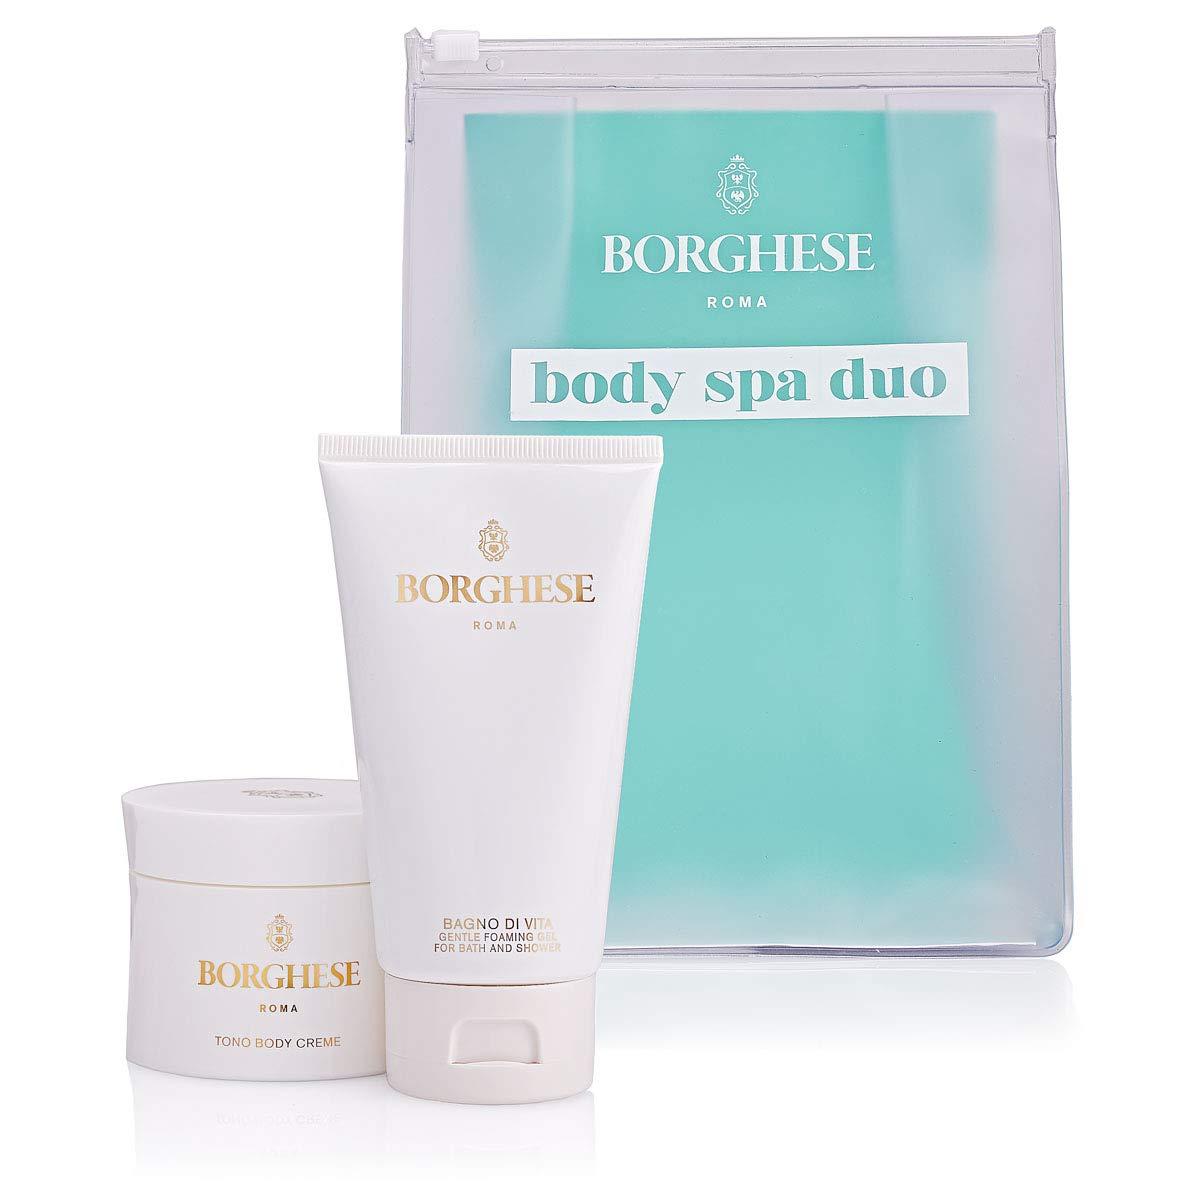 Borghese Body Spa Duo - Body Gel & Body Cream - 2 Count